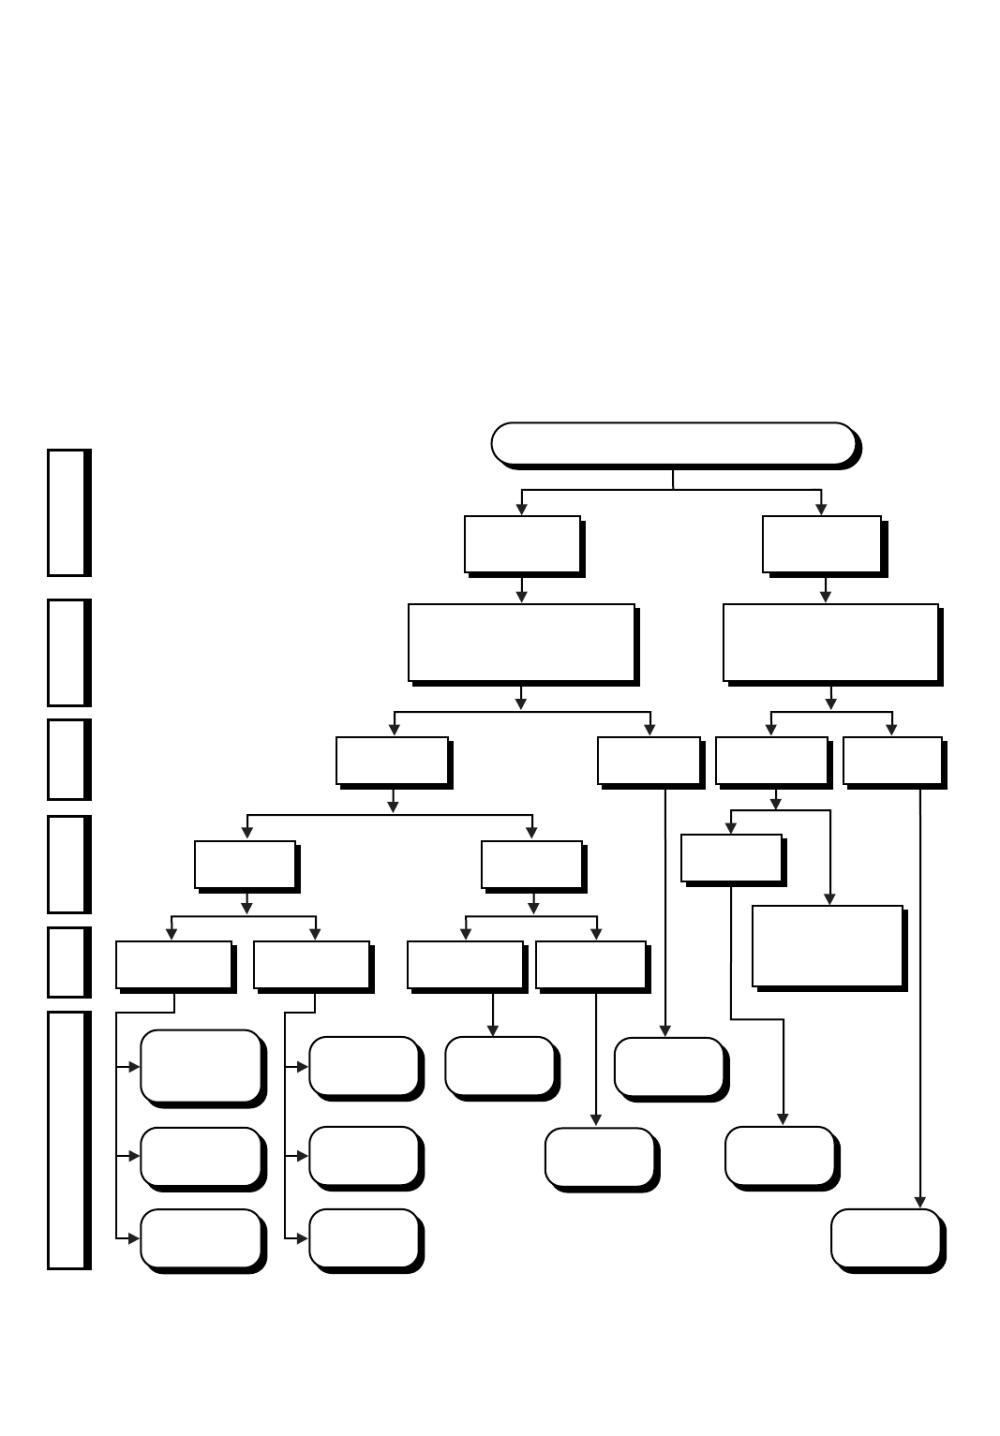 medium resolution of motor actuator selection guide brochure